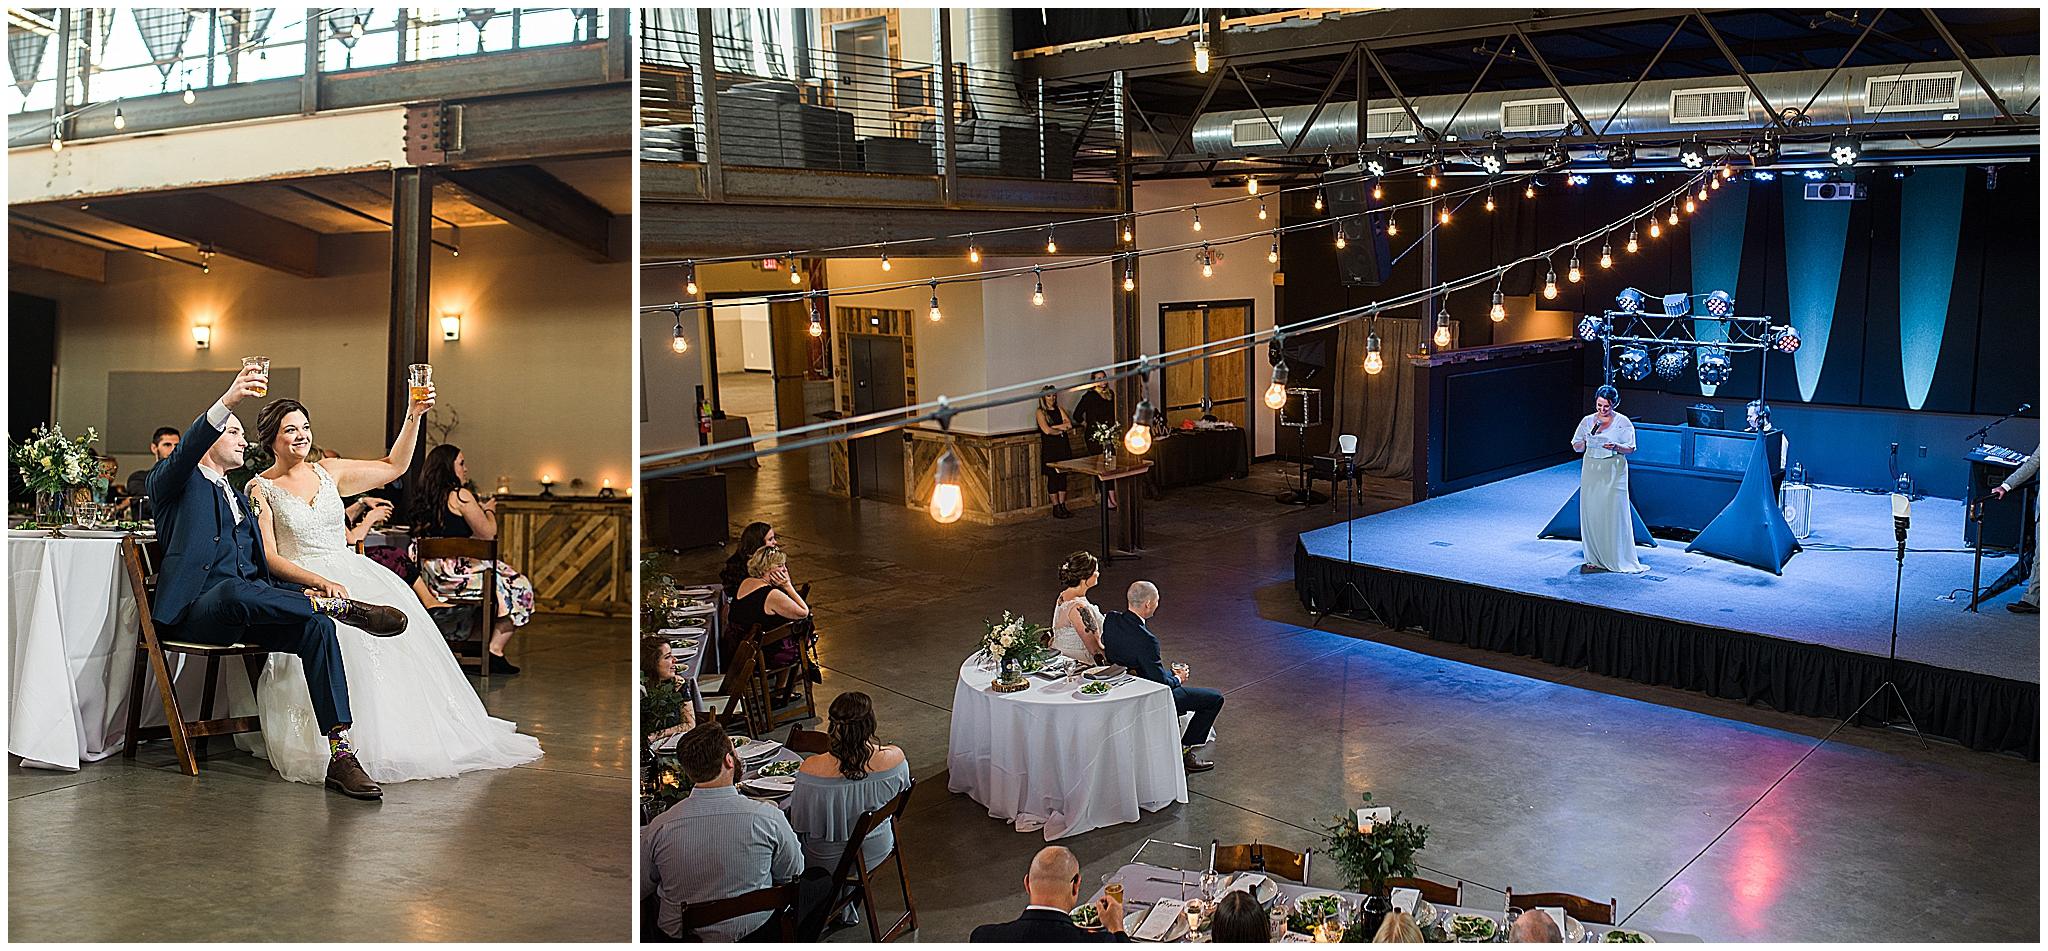 Wedding_Photographer_Asheville_Highland_Brewing_0021.jpg